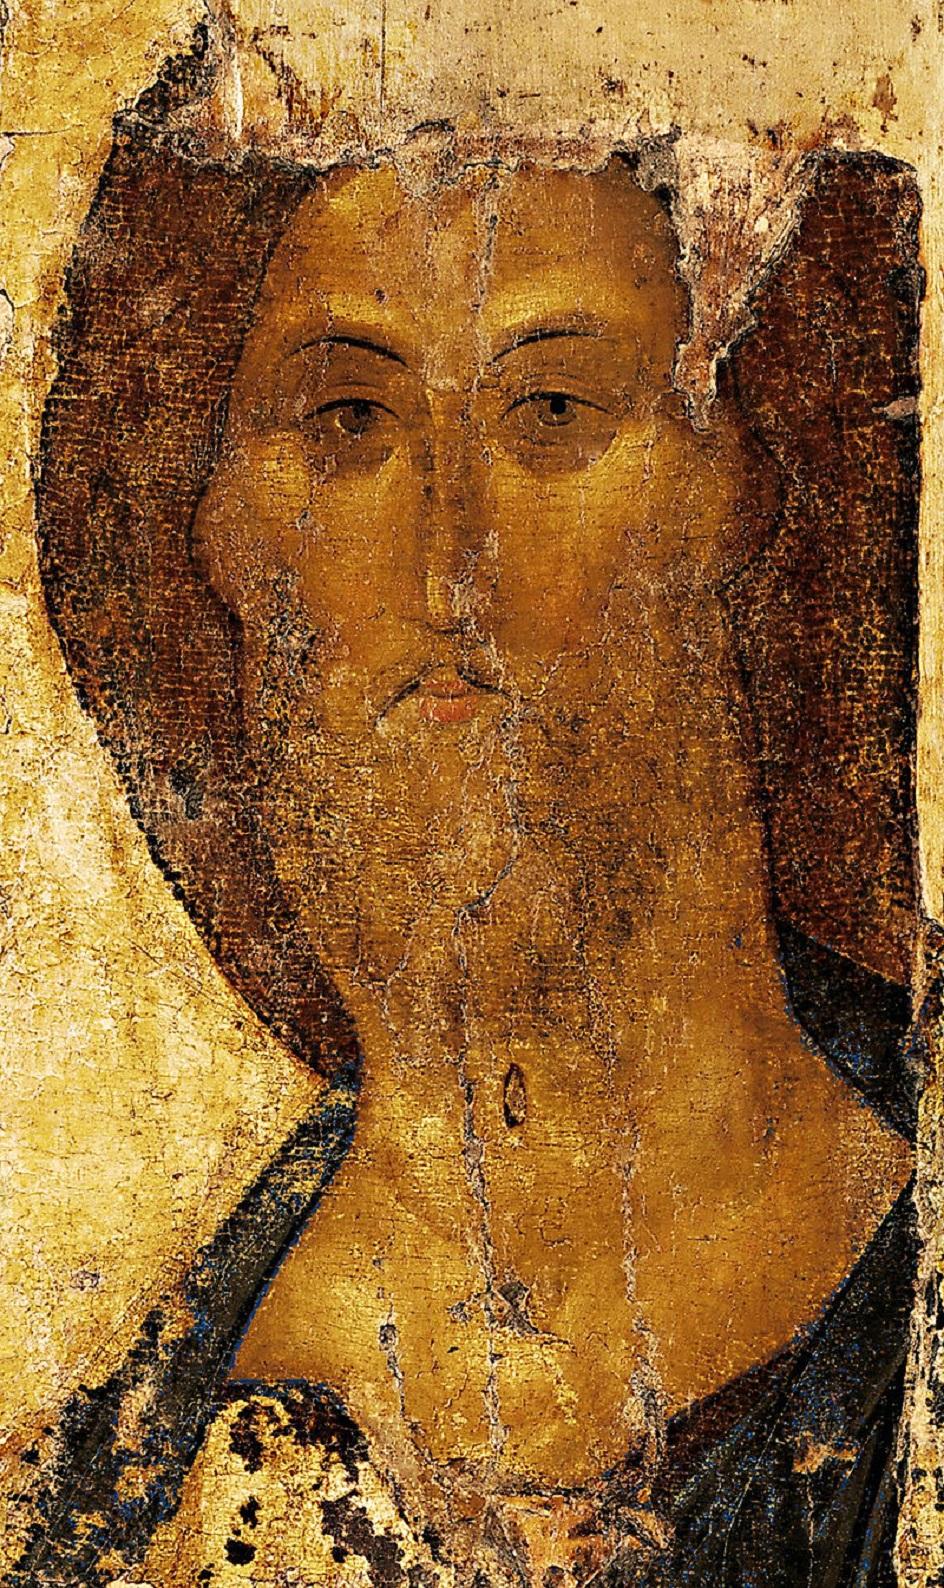 Икона. Андрей Рублев. Икона Спаса Звенигородского начала XV века